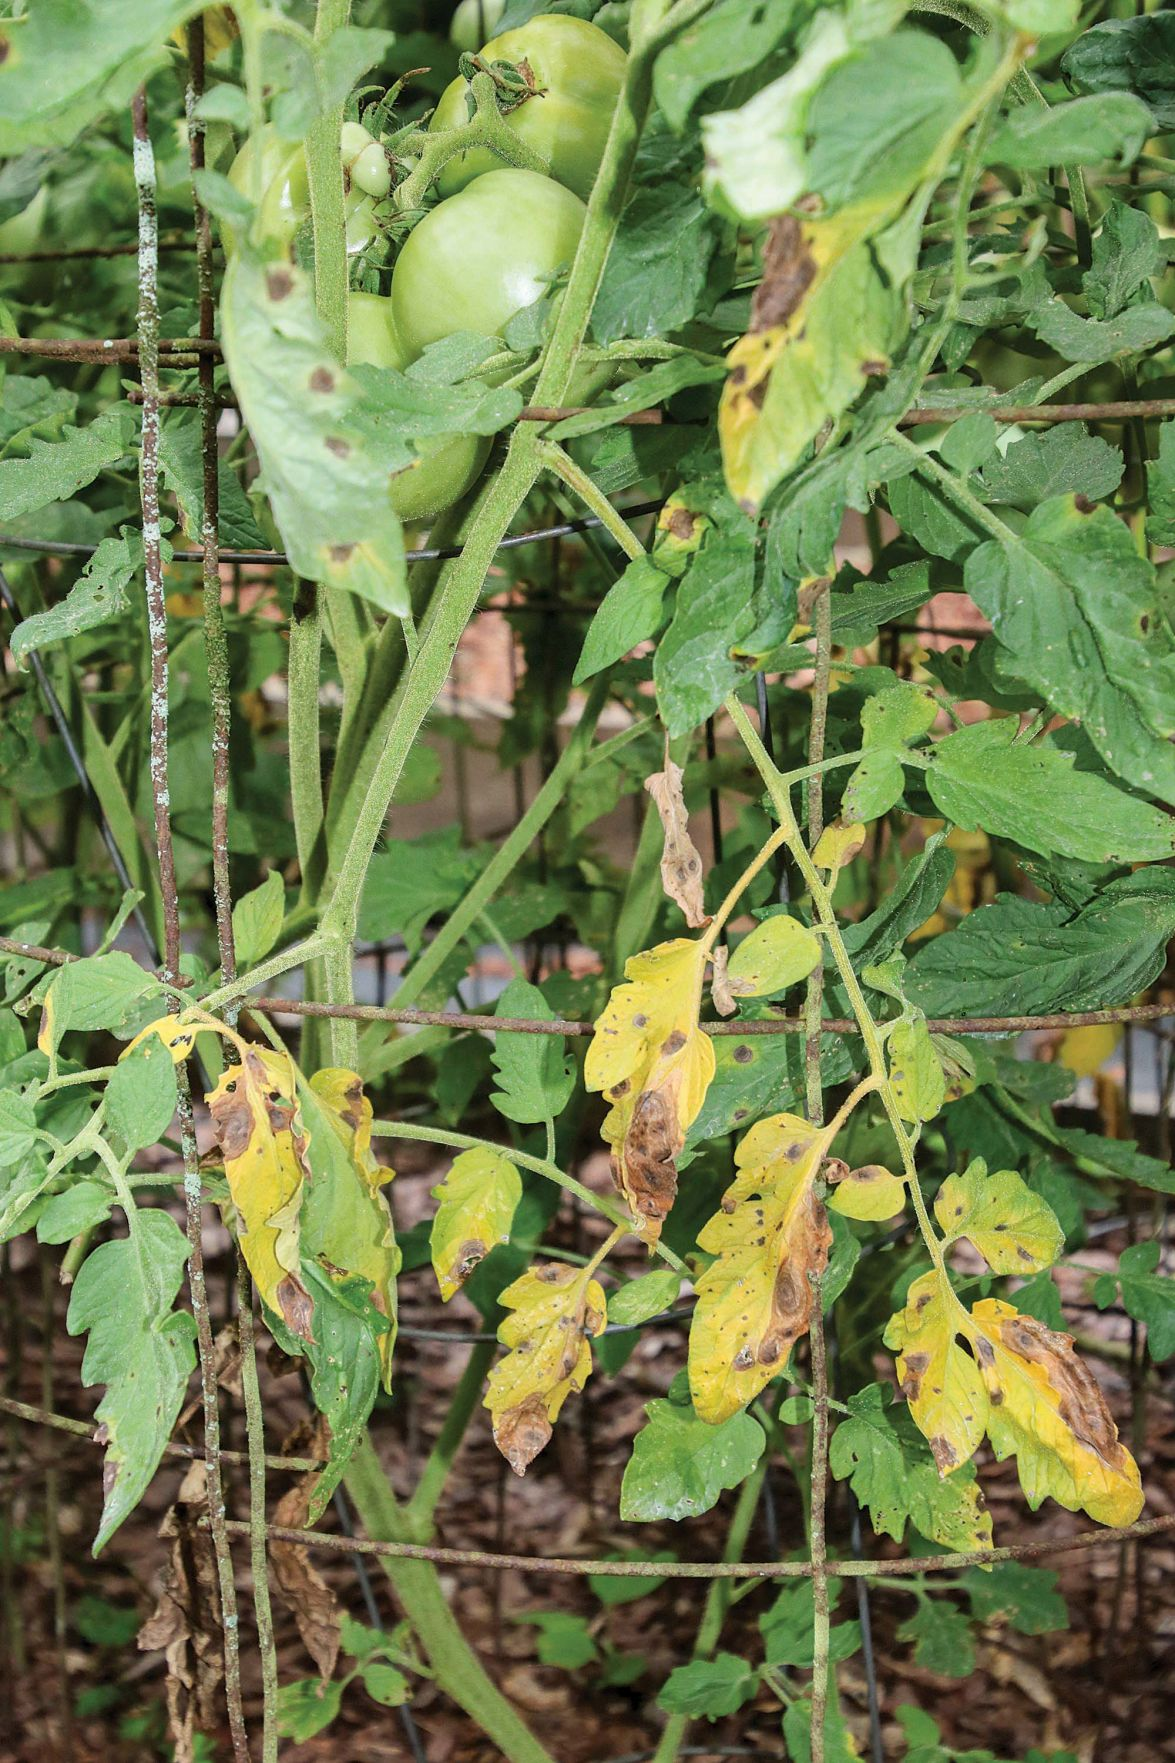 0705 Tomato workshop 1.jpg